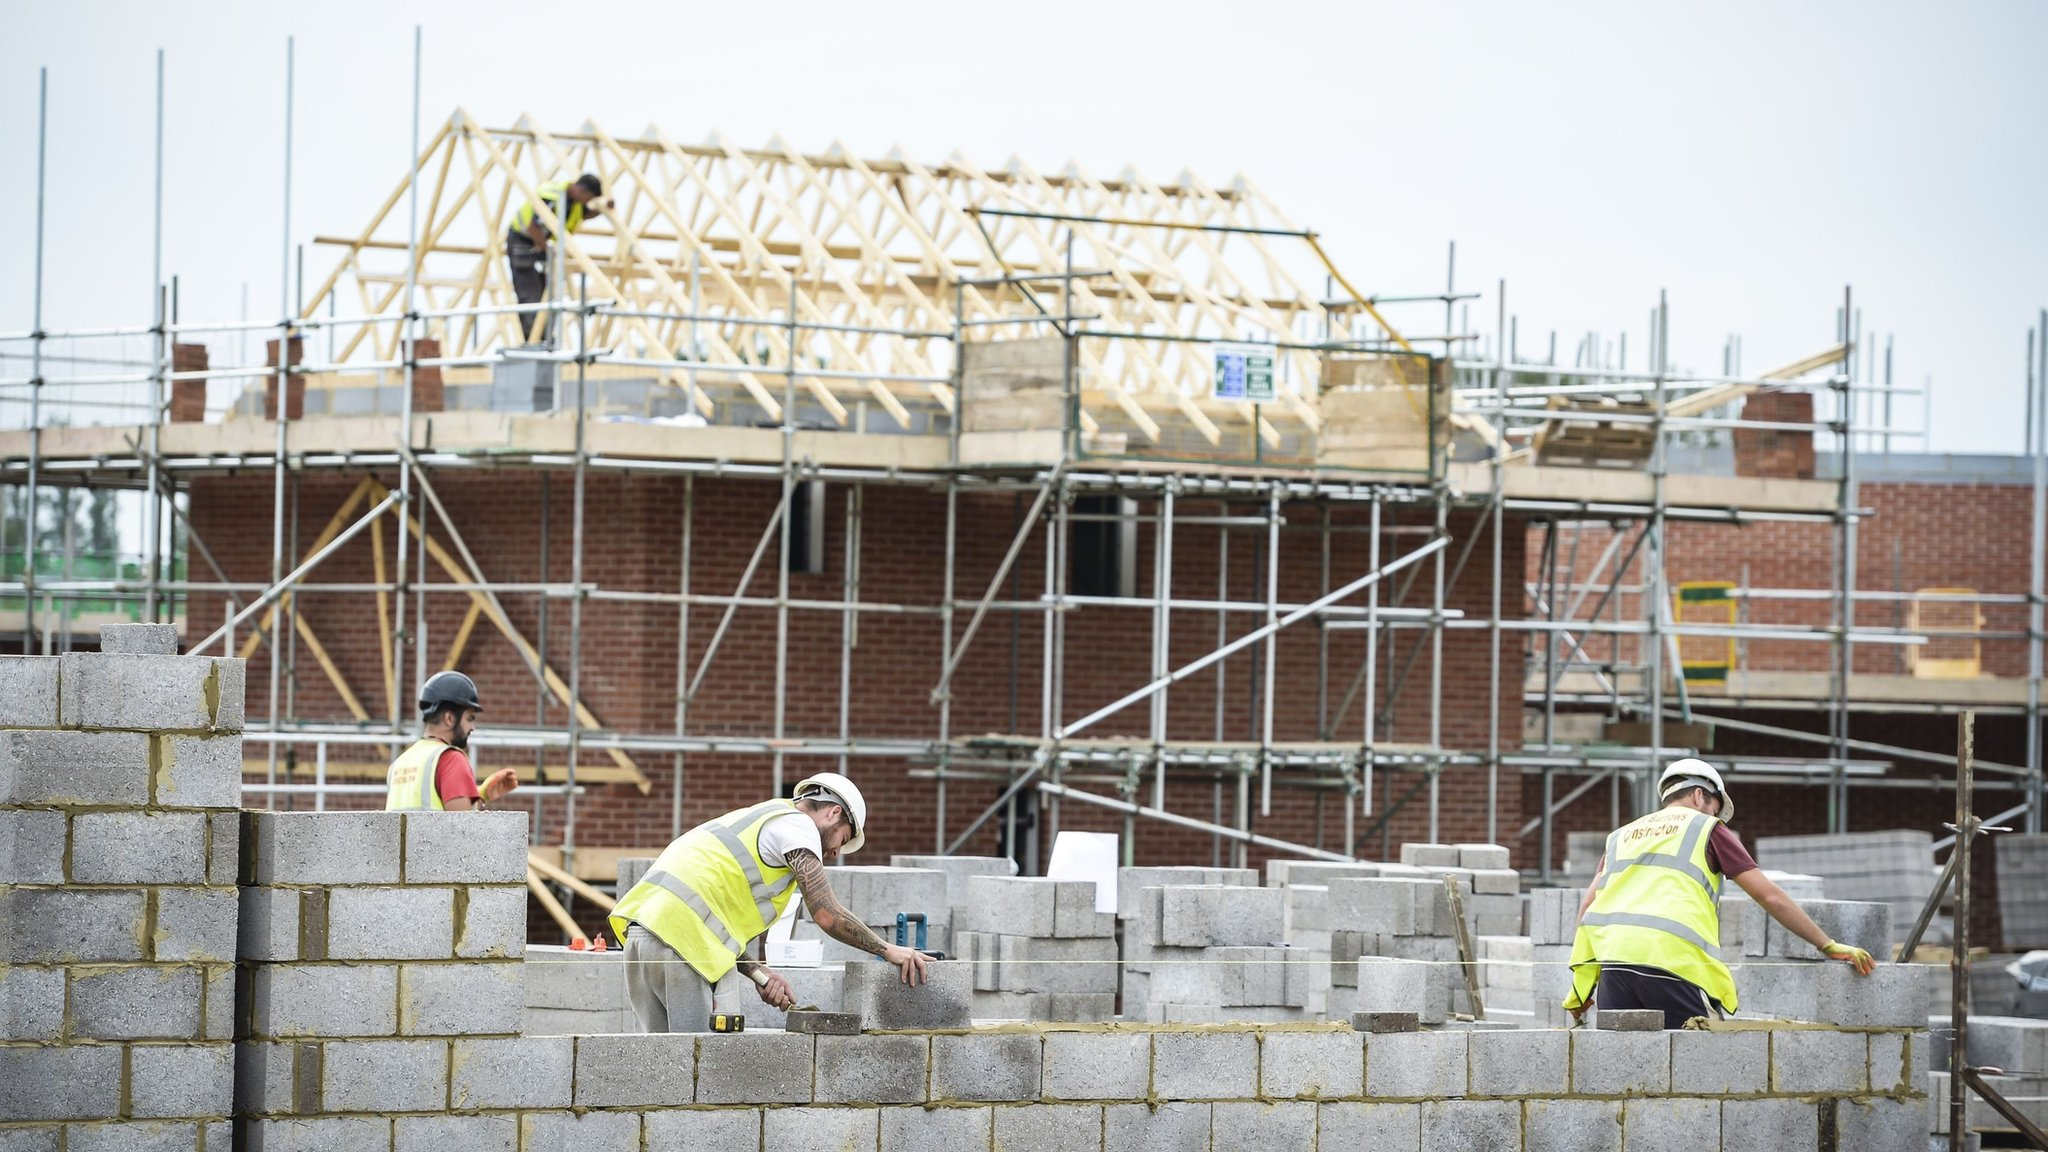 Lagan Construction Group £45m in debt